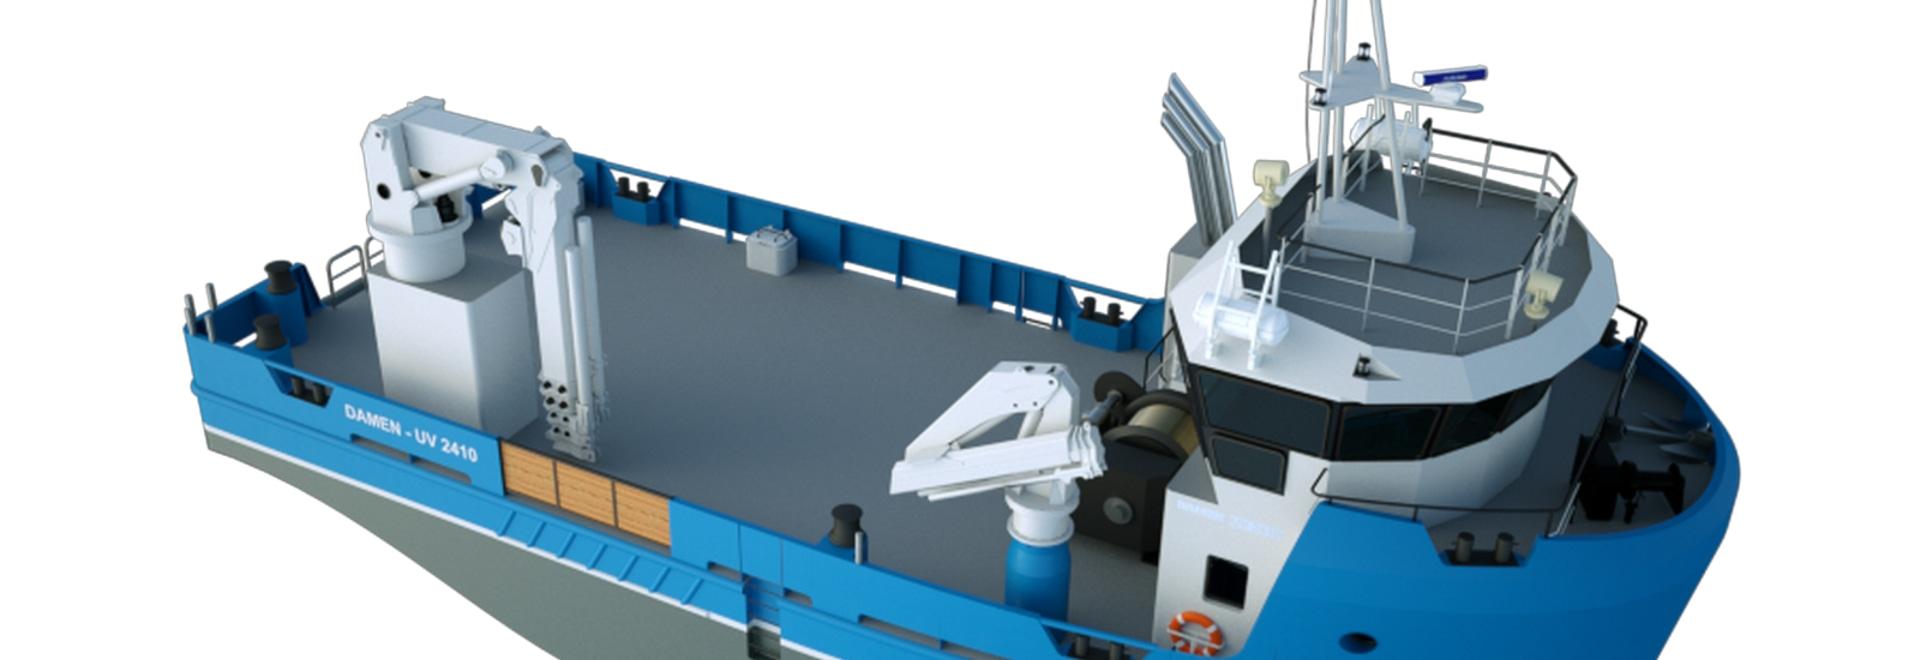 Utility Vessel 2410 Aquaculture